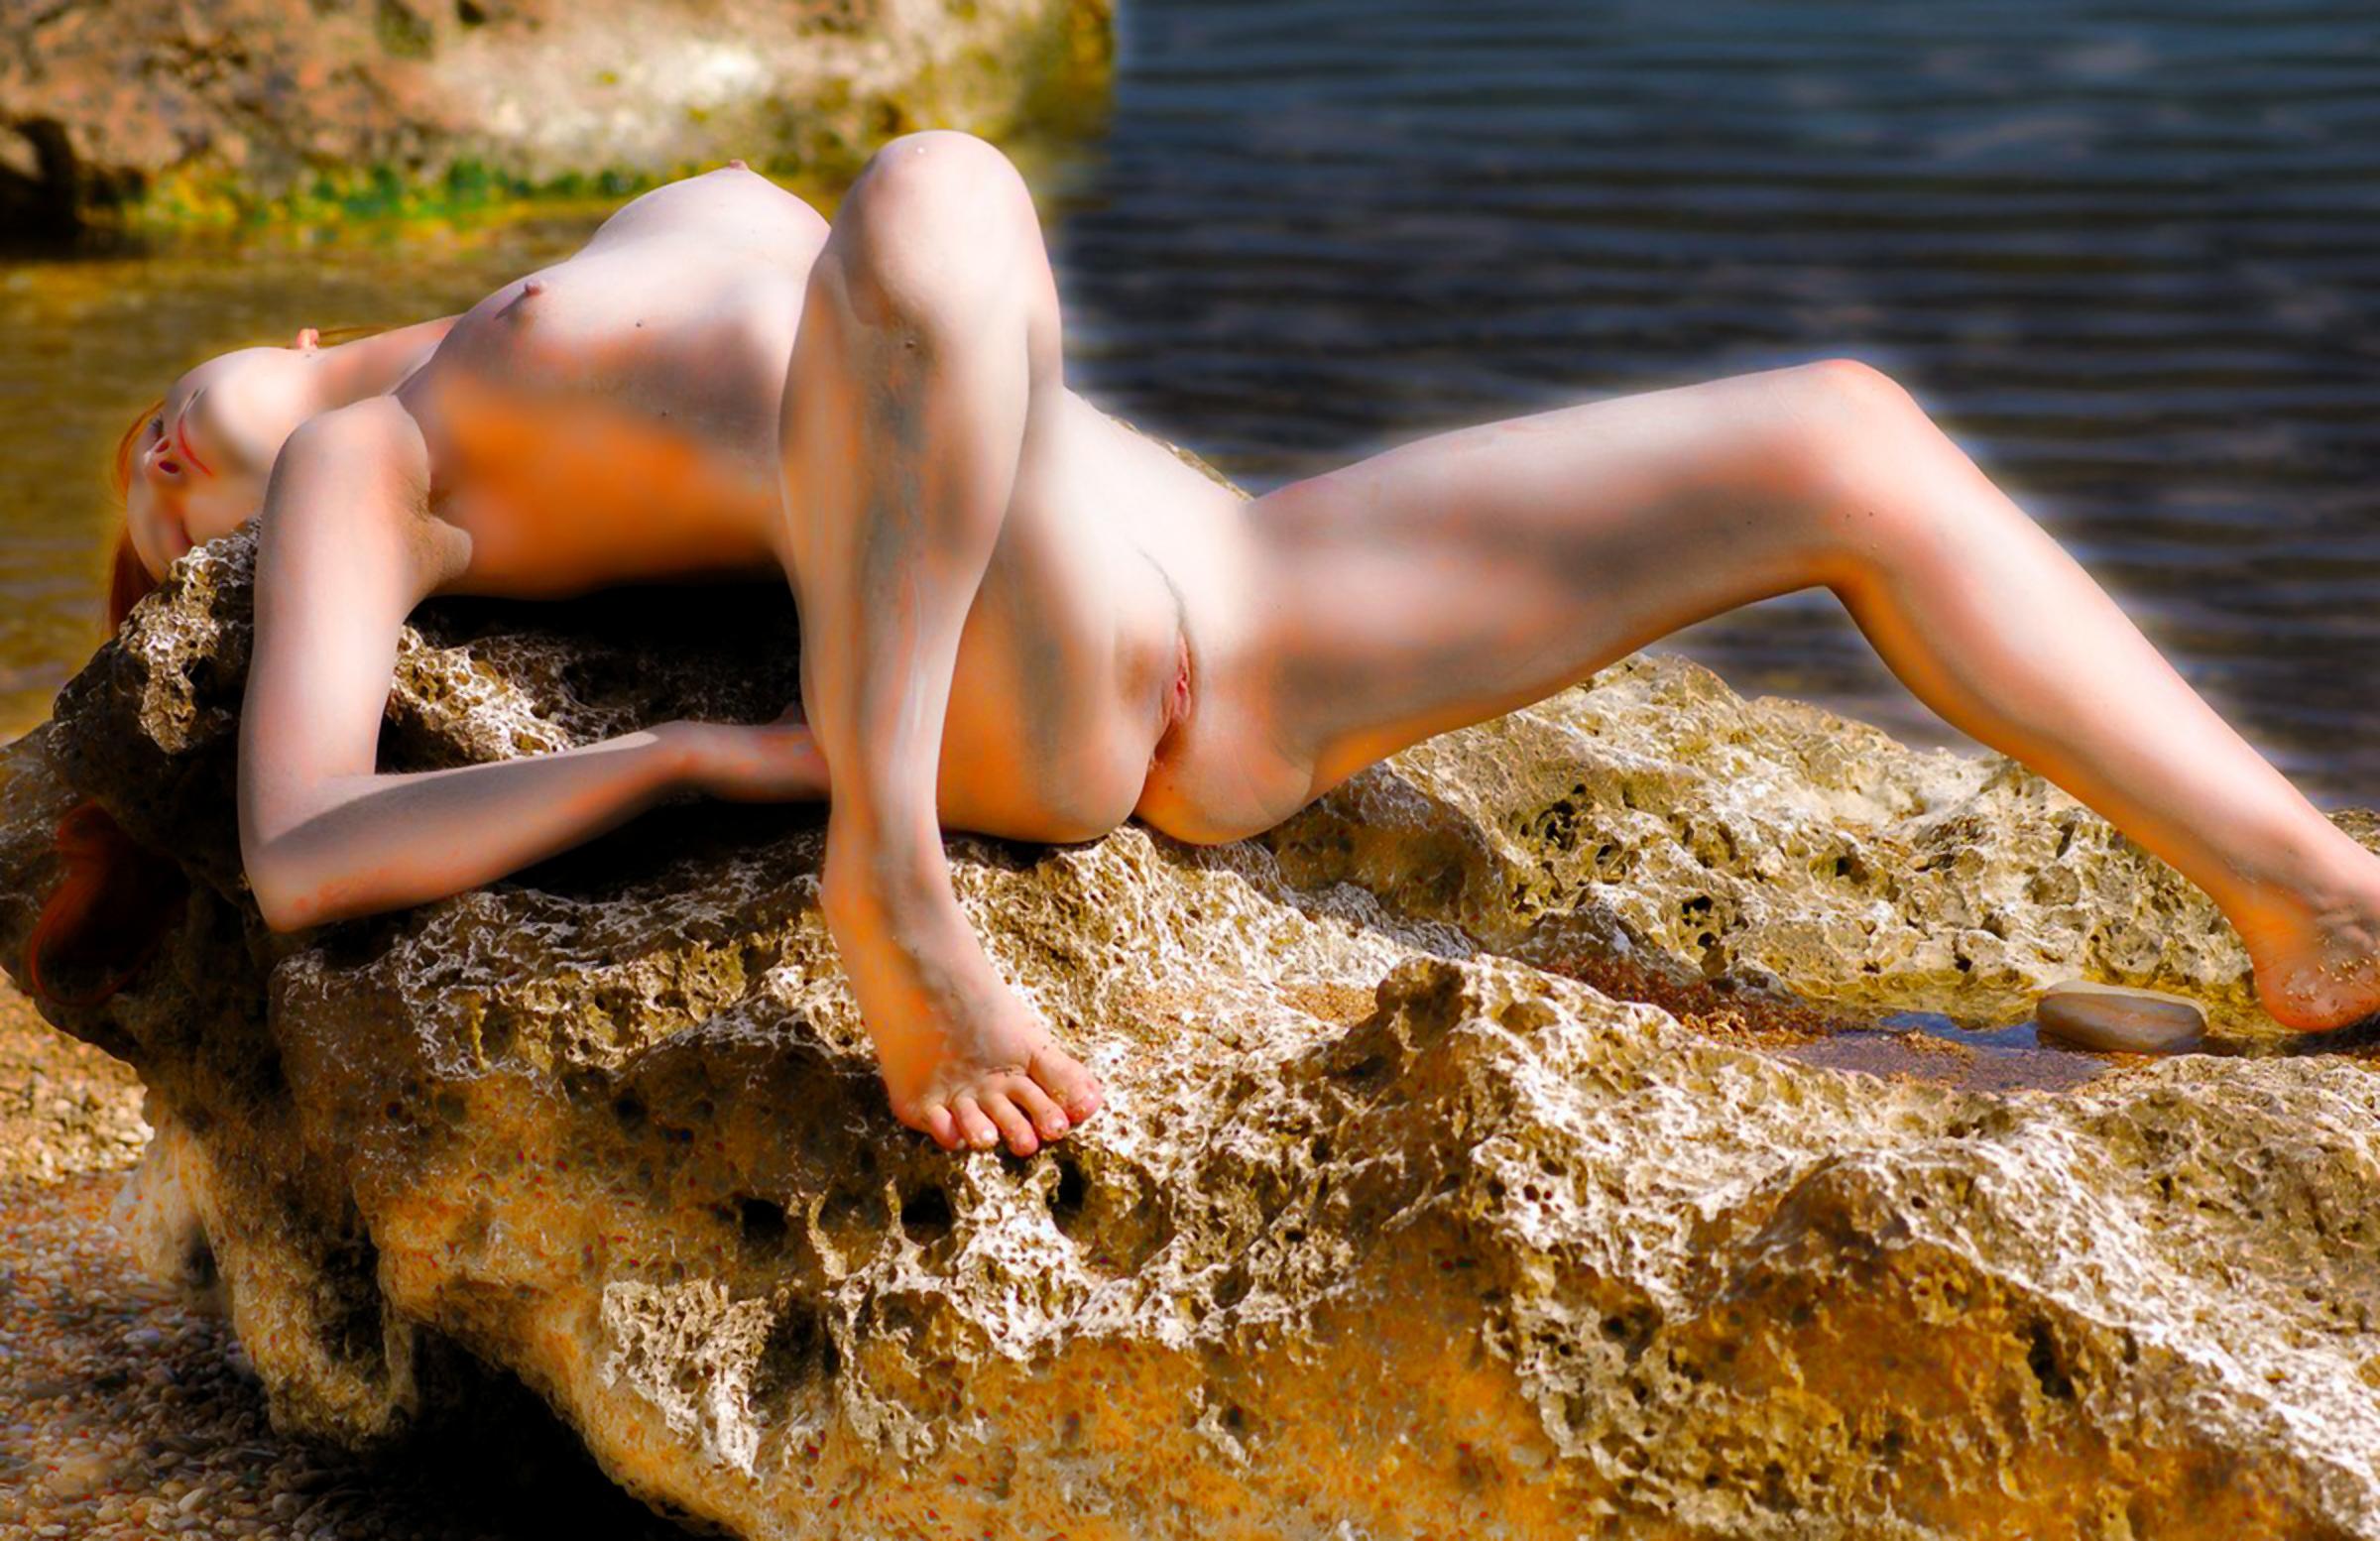 Creative Mons Nude Women